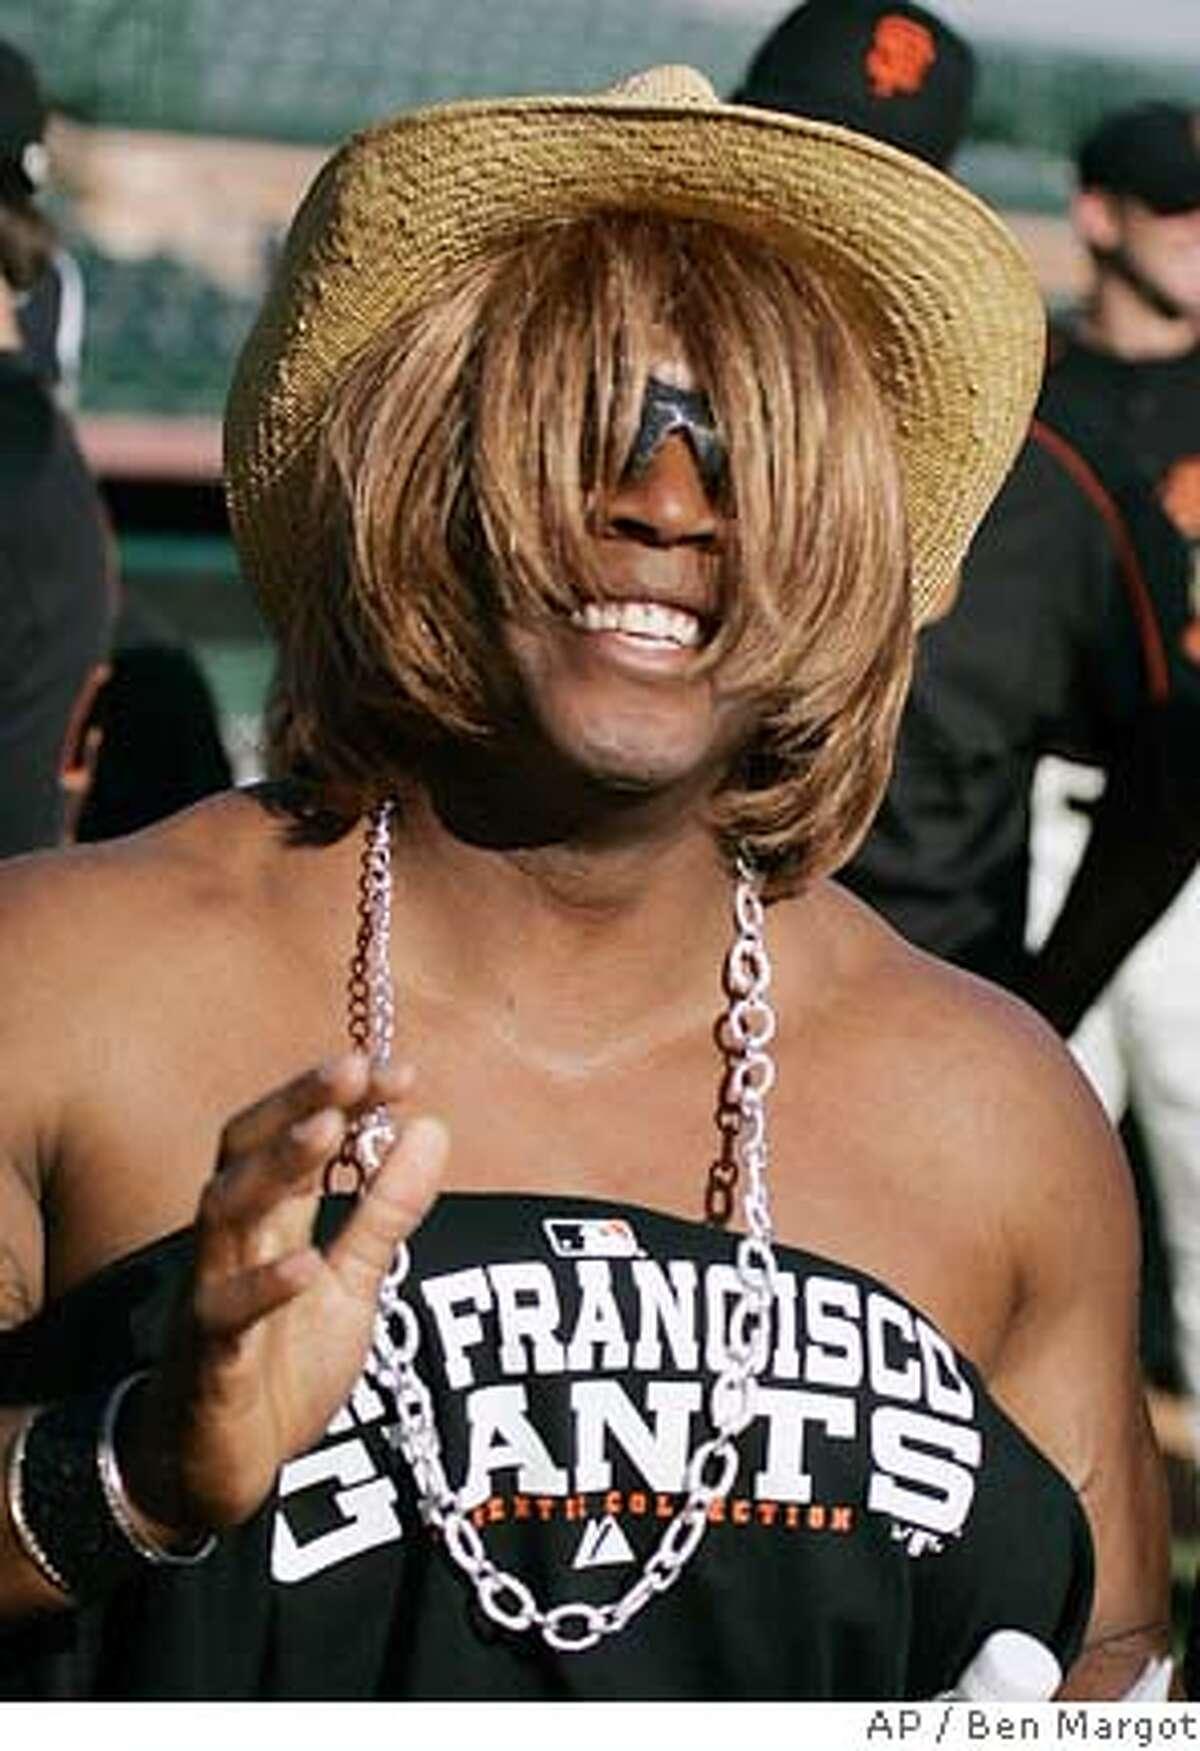 Dressed in drag portraying Paula Abdul on